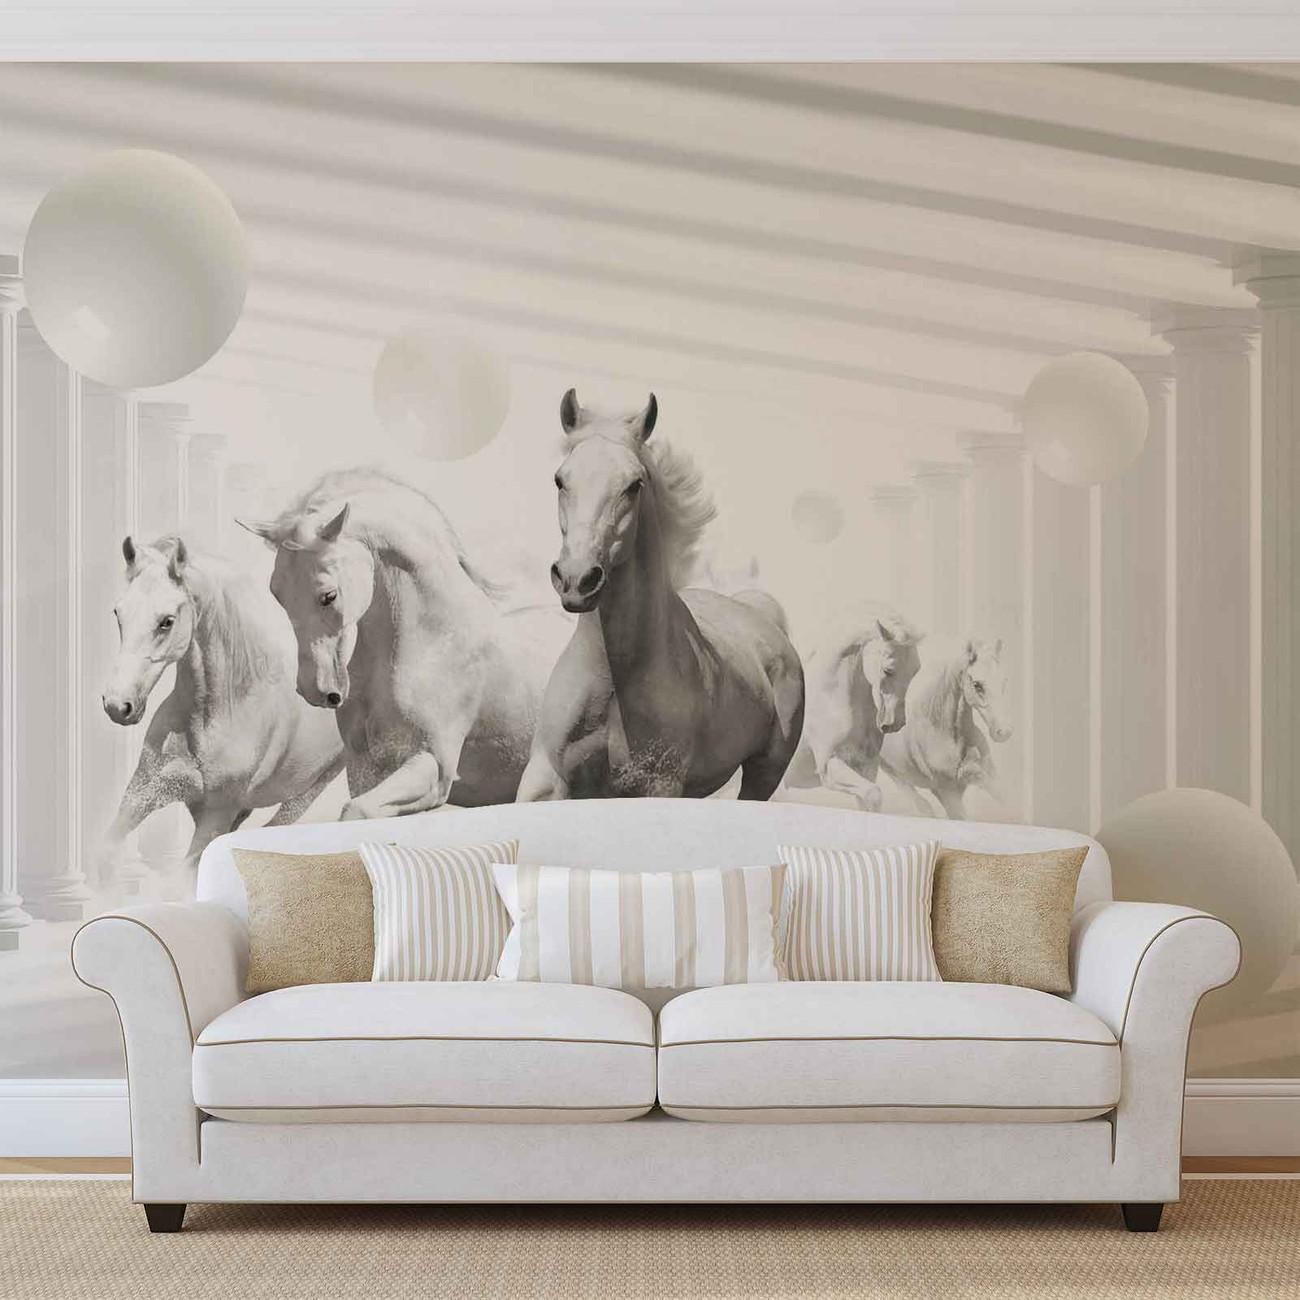 fototapete, tapete pferde weiß kugeln bei europosters - kostenloser